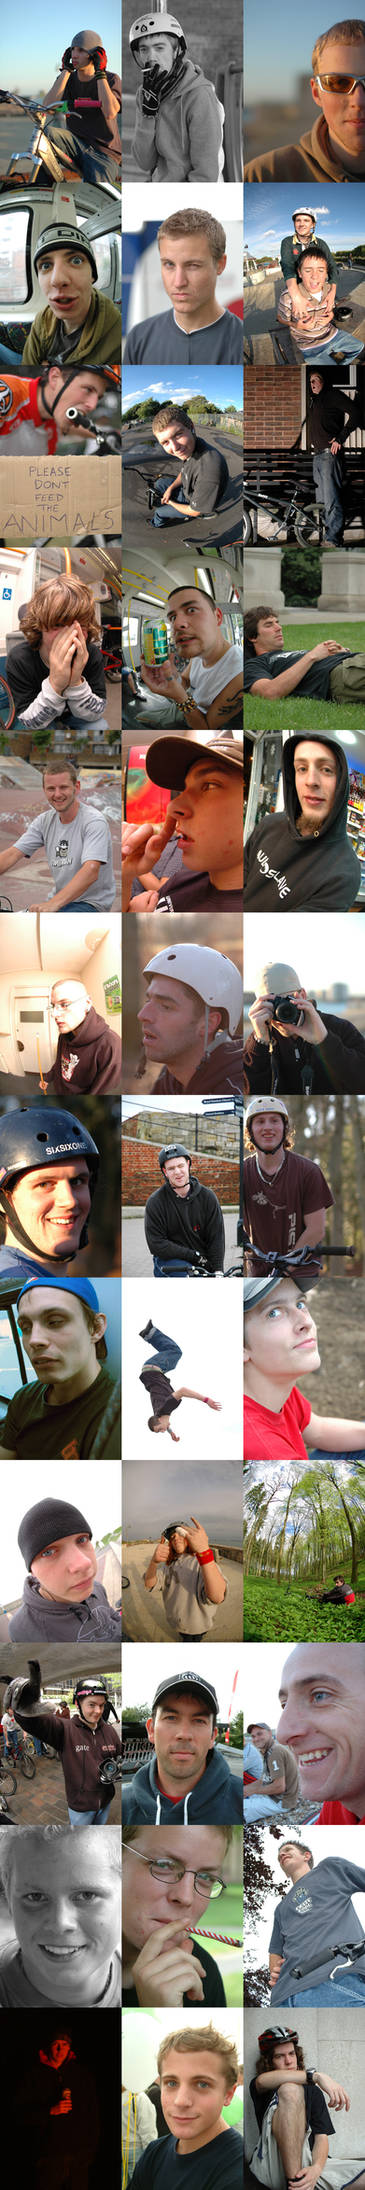 Rider Portraits